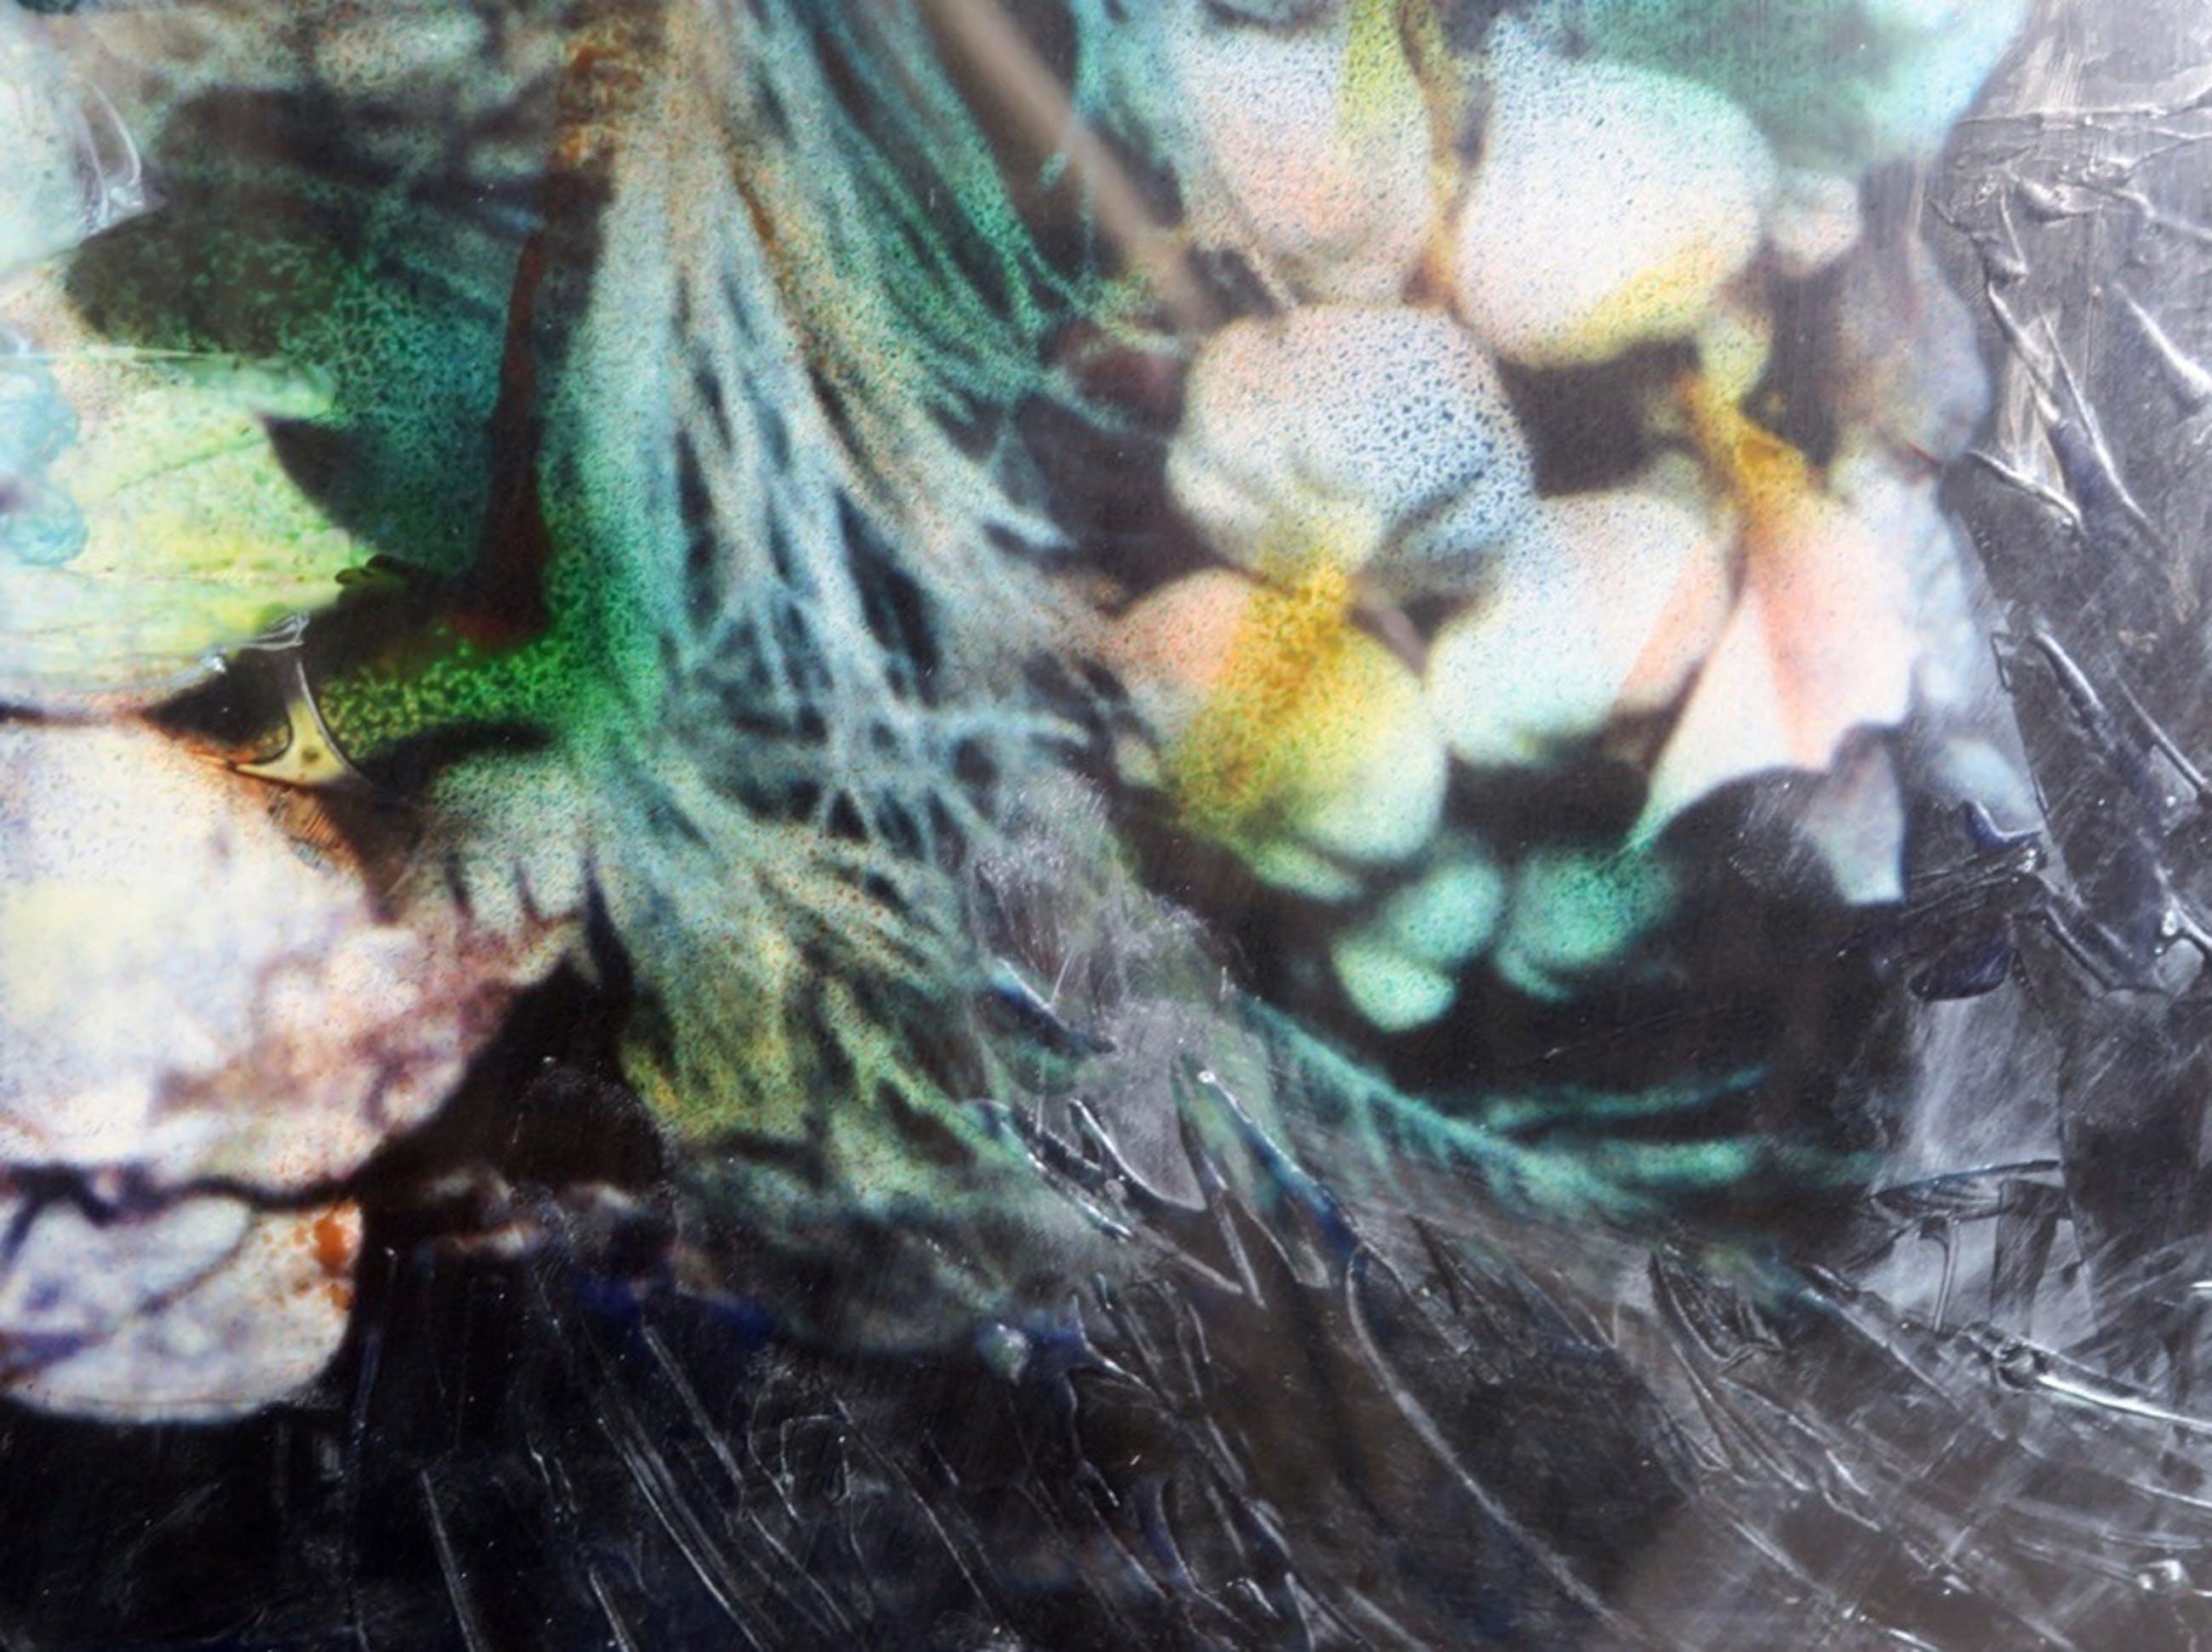 Franca Muller Jabusch: Handbewerkte foto, Fossiled memory - Ingelijst kopen? Bied vanaf 35!